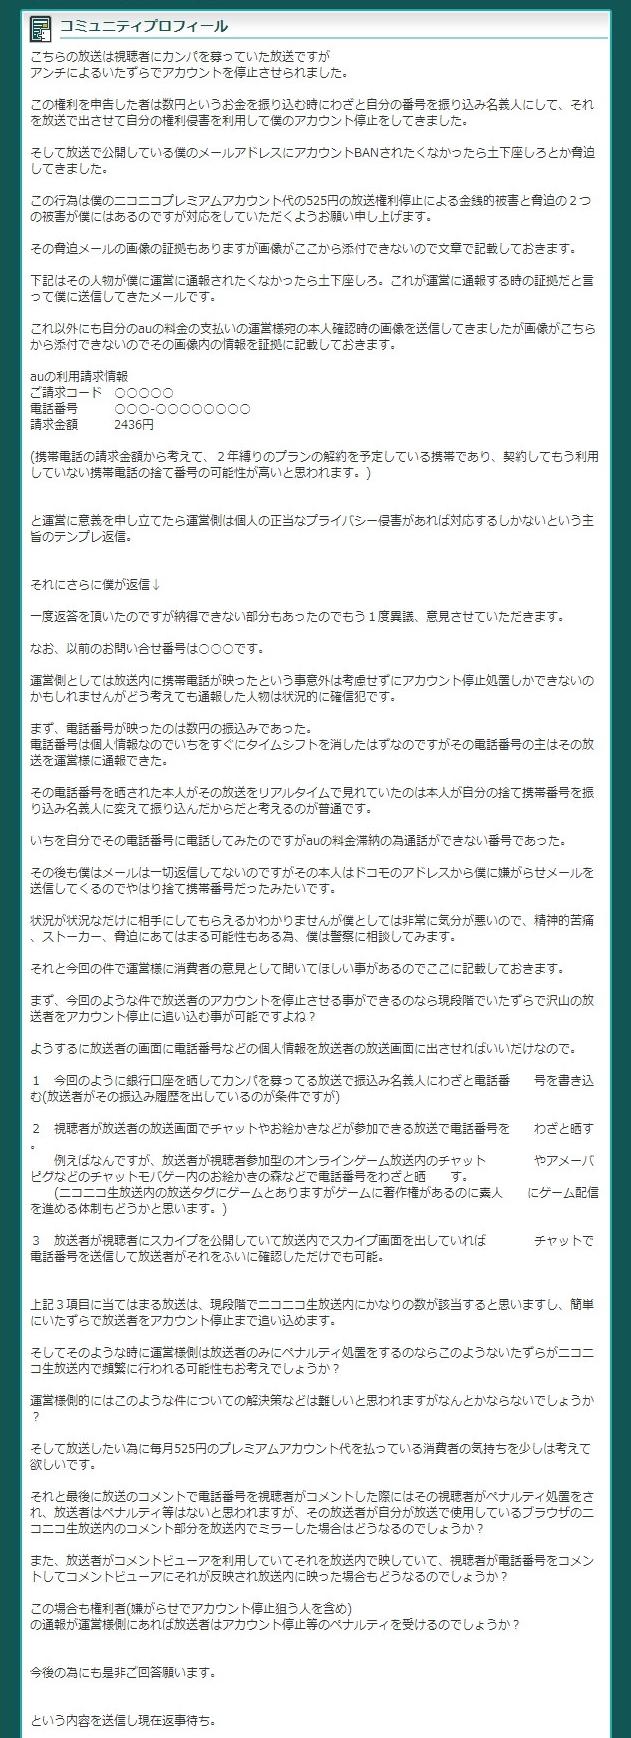 2014-2-13_5-25-0_No-00(2).jpg